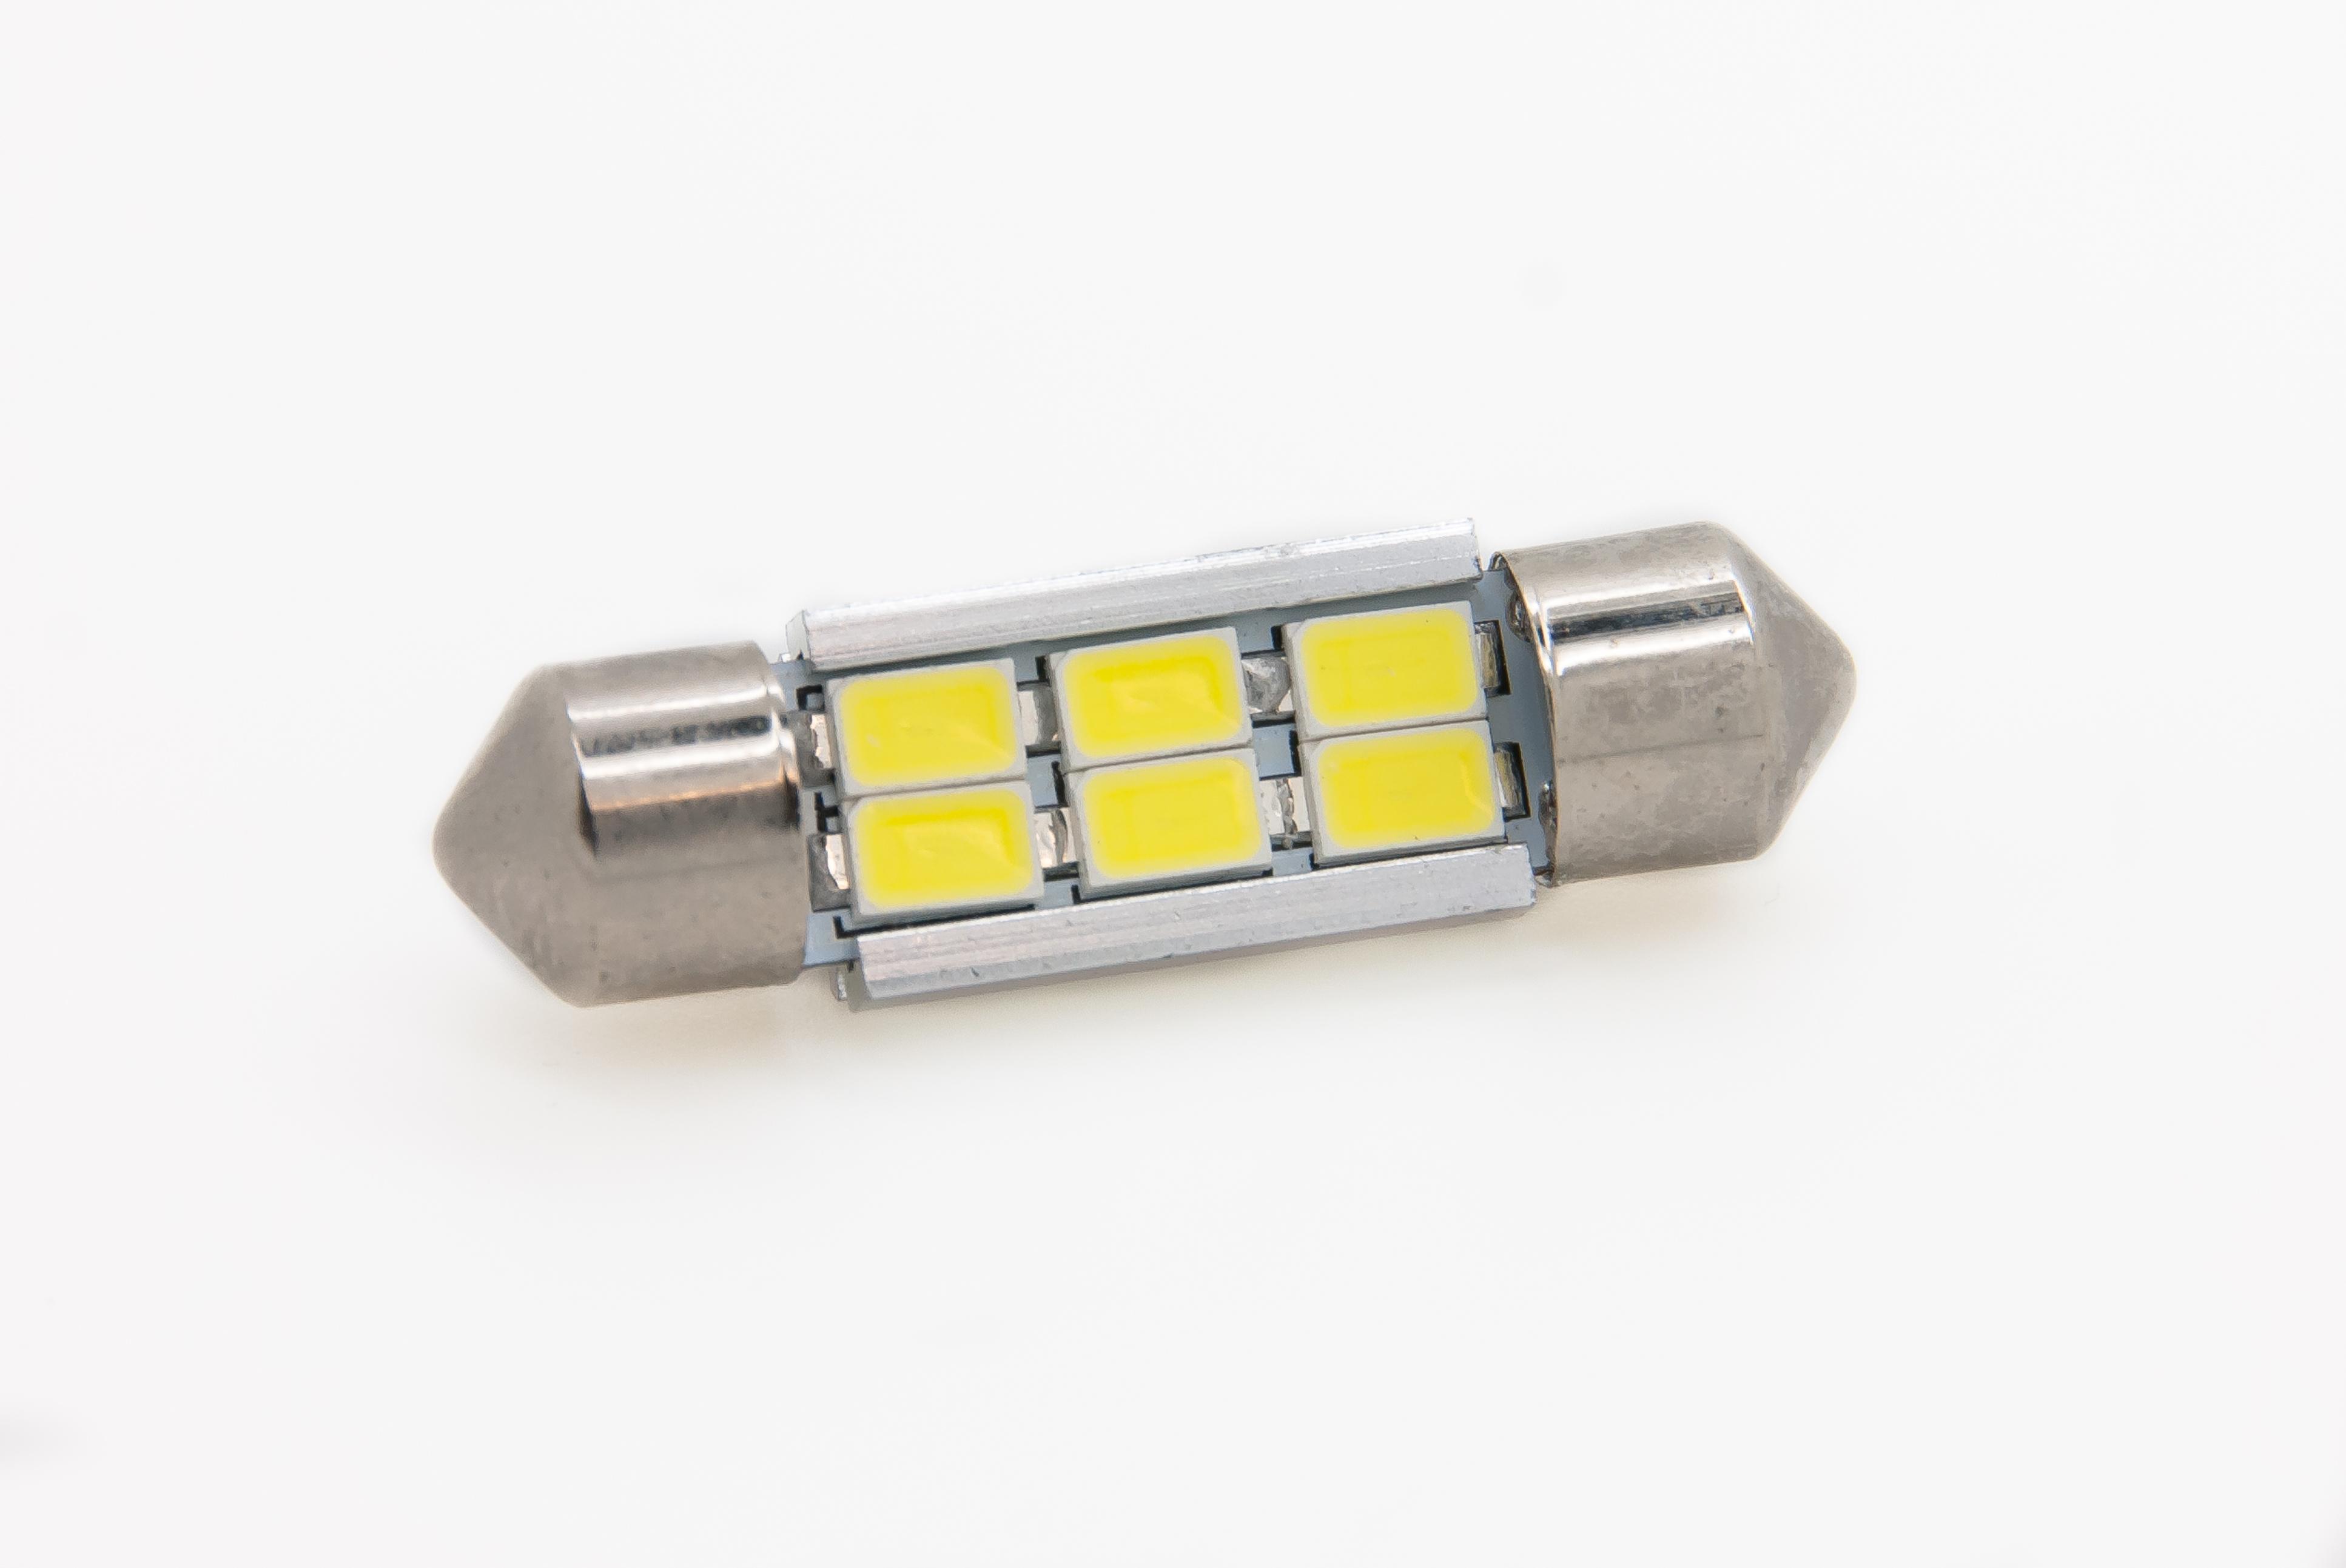 36MM-W%20NEWX1 Wunderbar Led Lampen Auto Innenraum Dekorationen